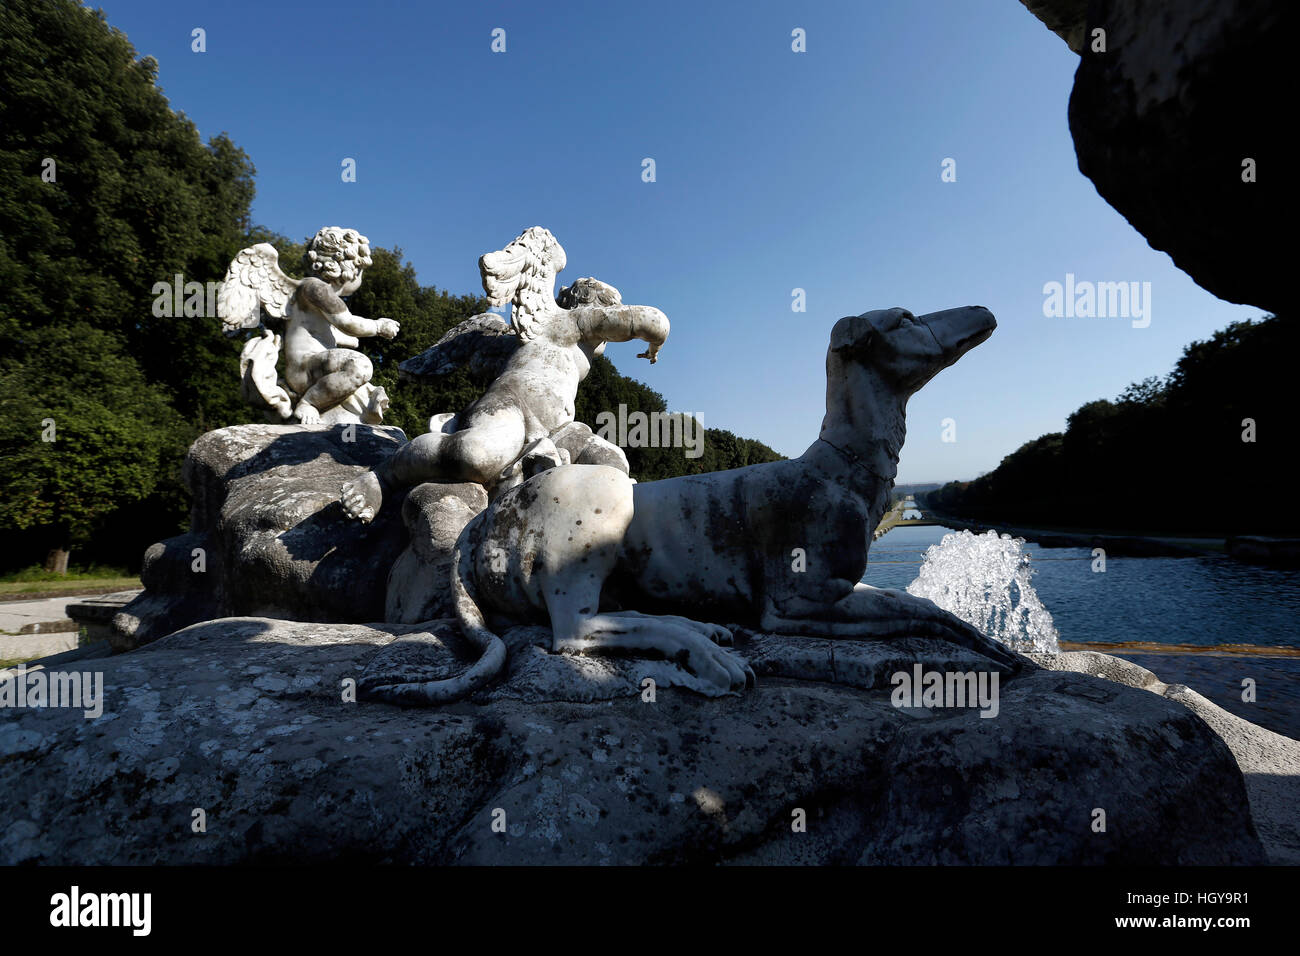 Venus And Adonis Statue Adonis Statue Stock Ph...